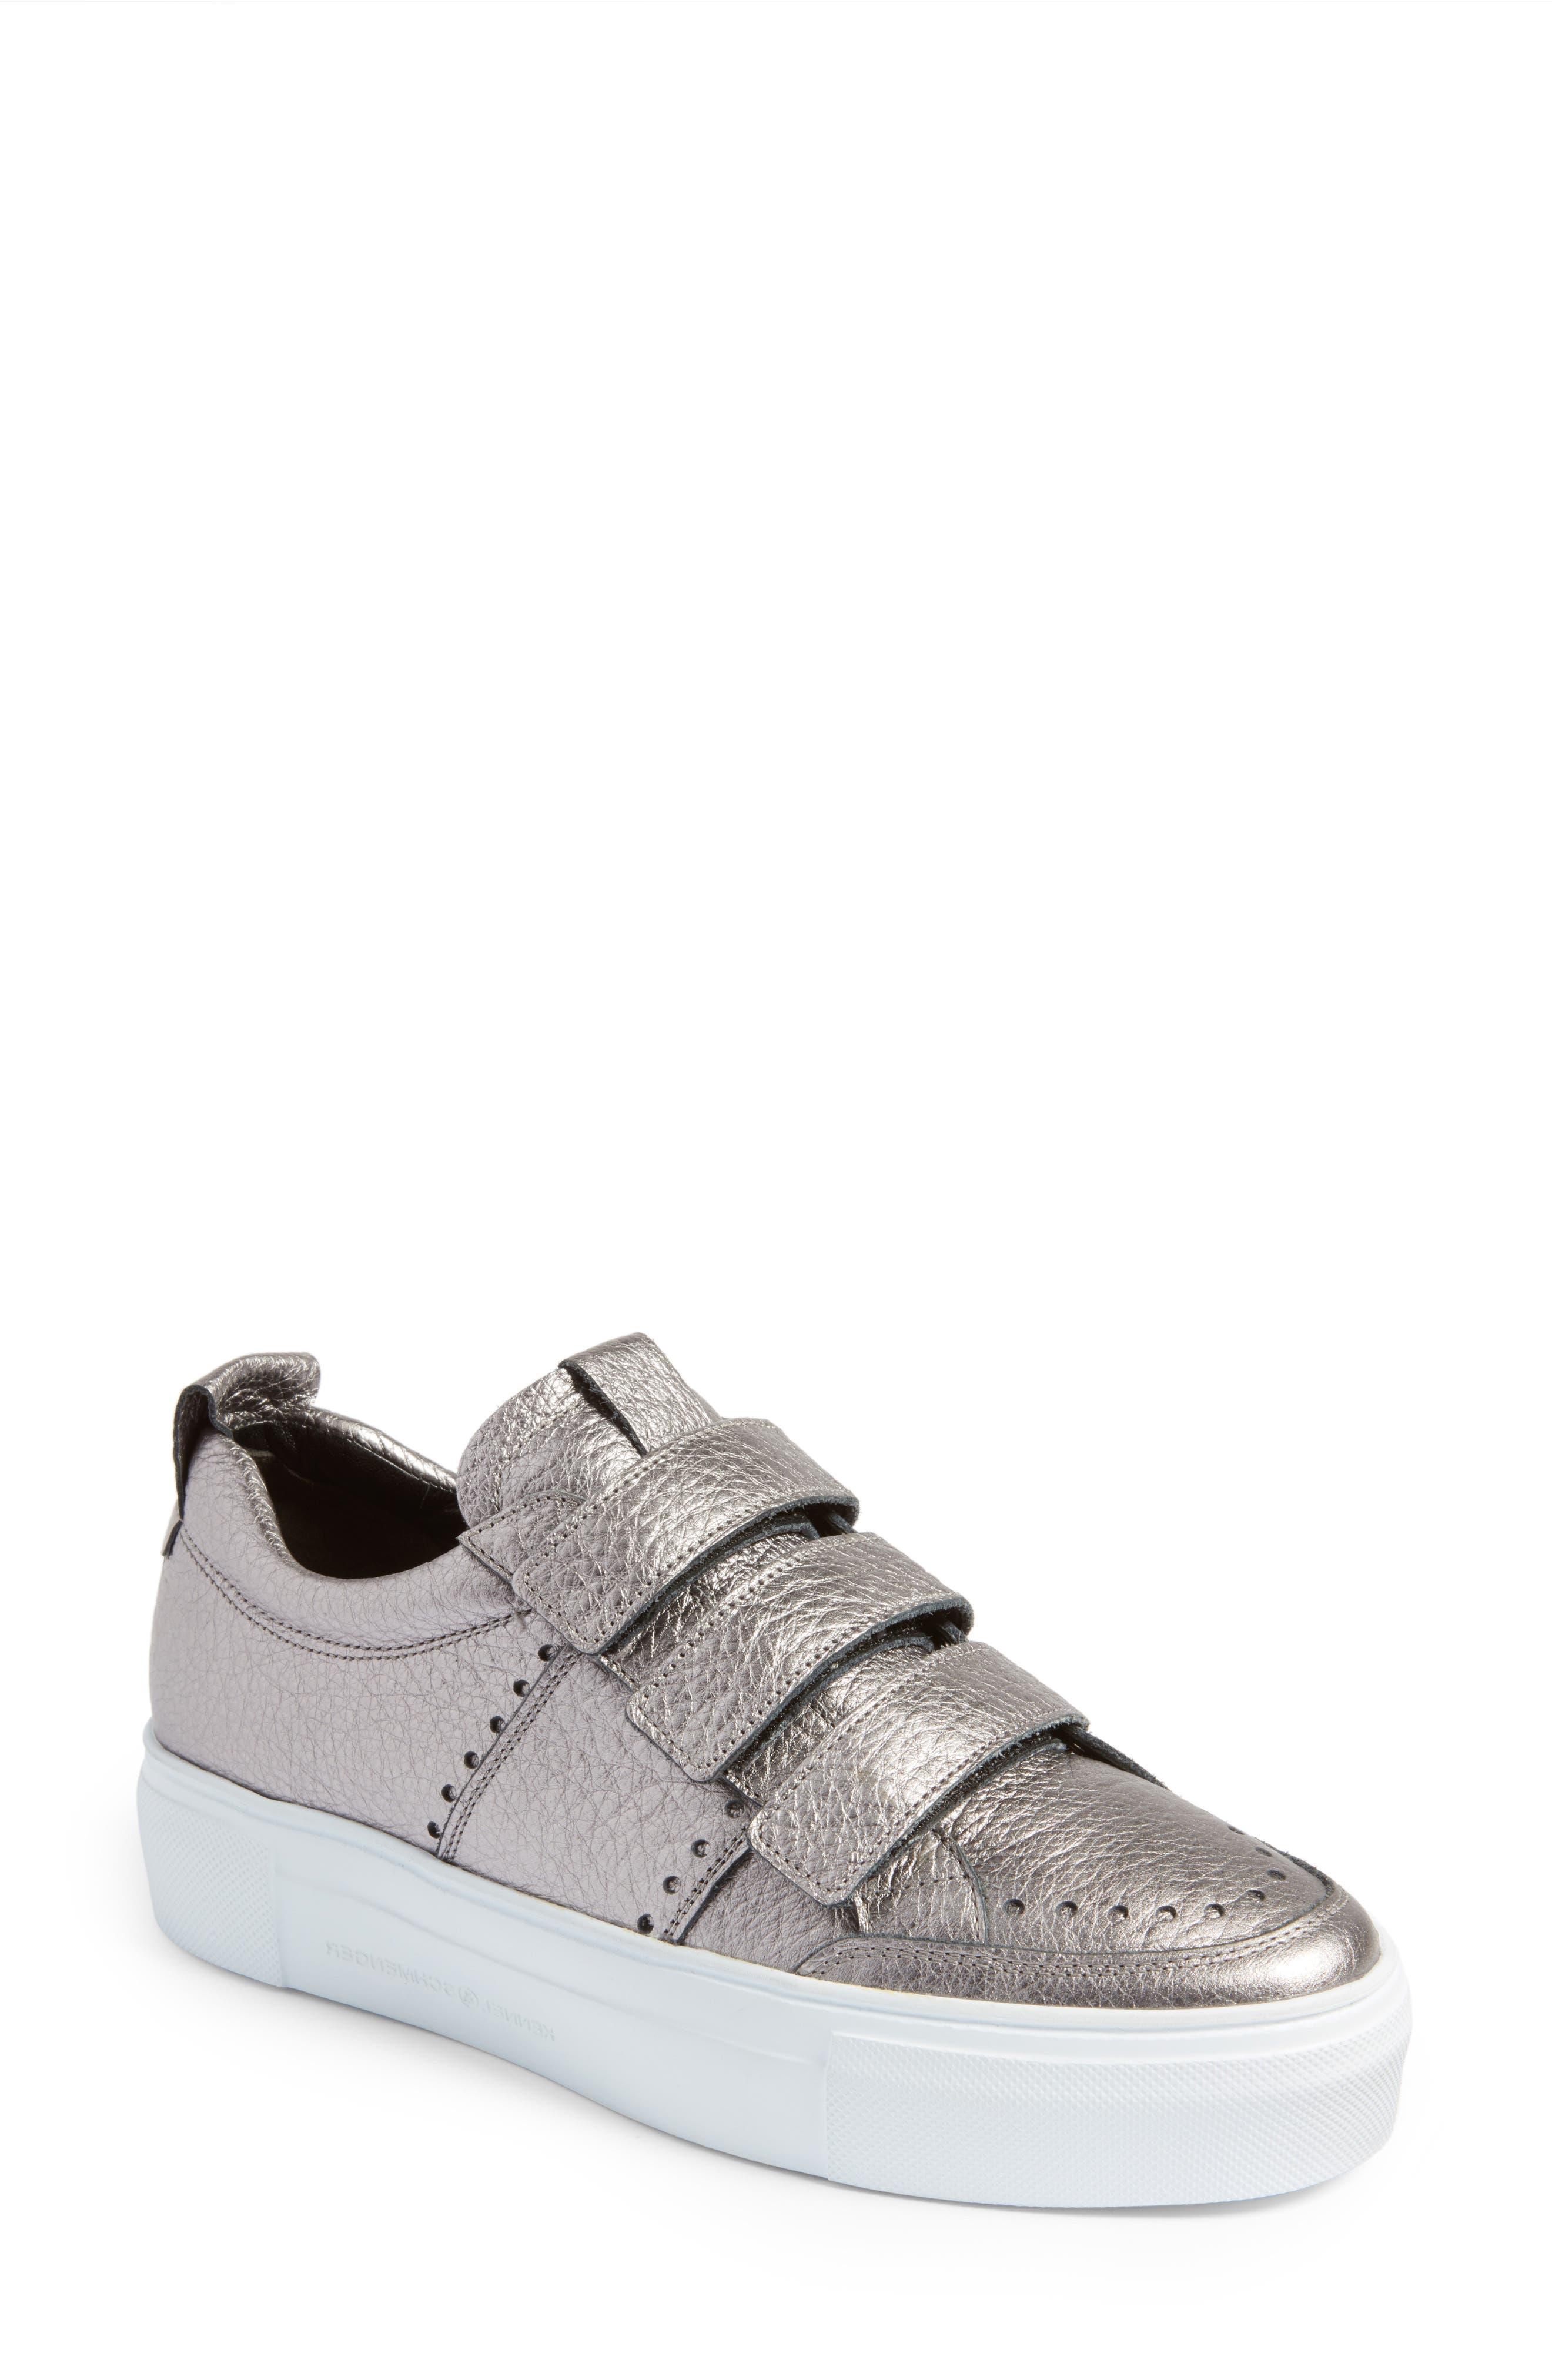 Kennel & Schmenger Big Low Top Tab Sneaker,                         Main,                         color, 020